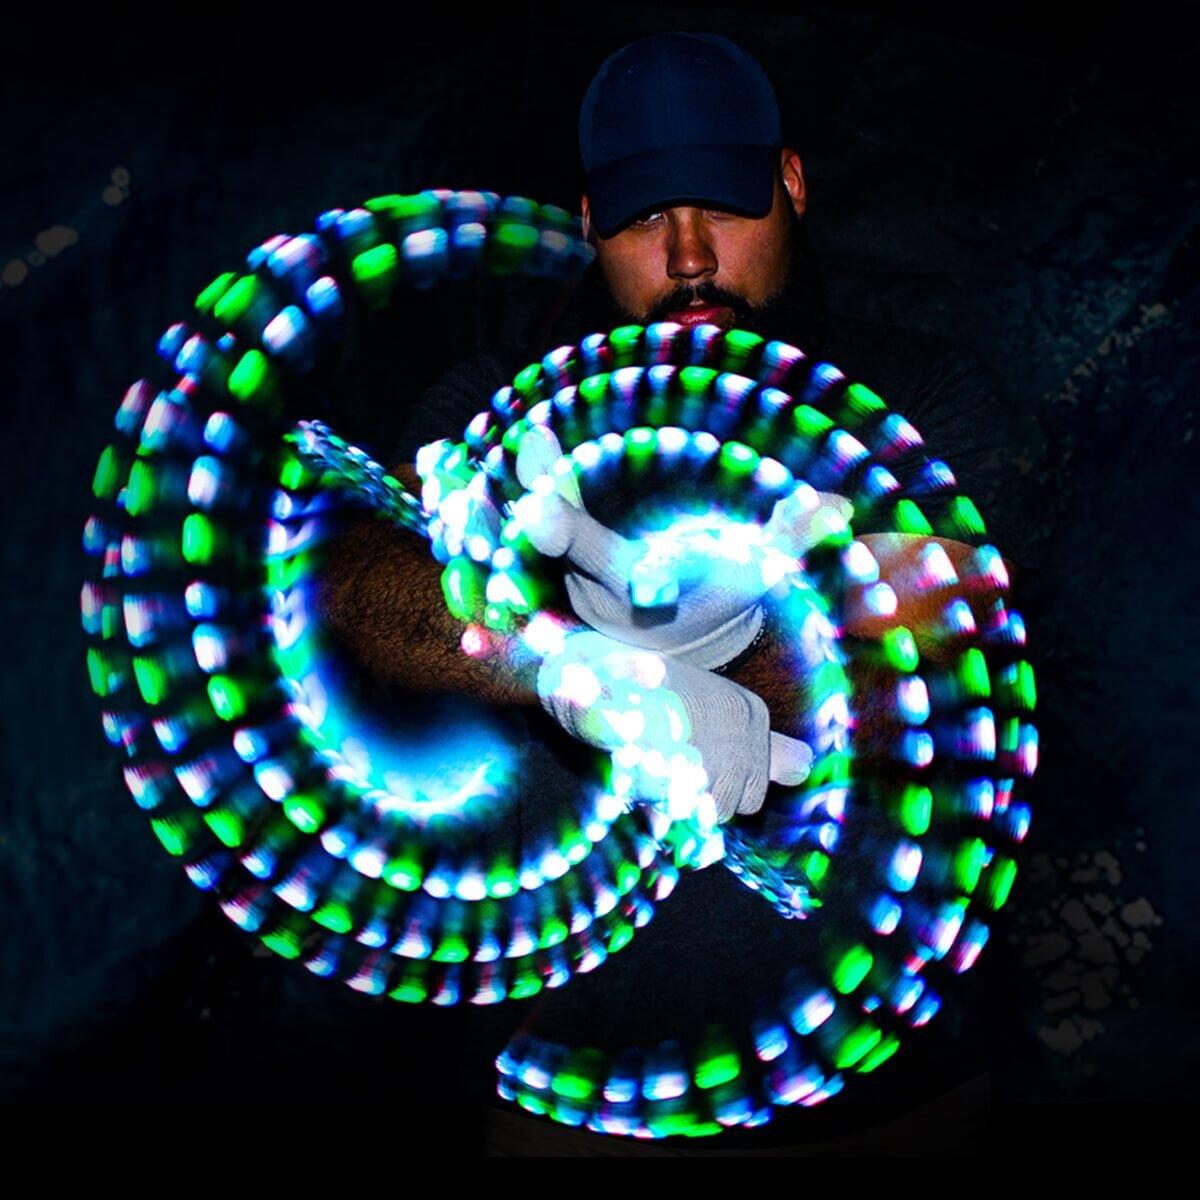 GloFX Gel Glove Set - Light Up Rave EDM 9 Mode LED Gloves by GloFX (Image #1)